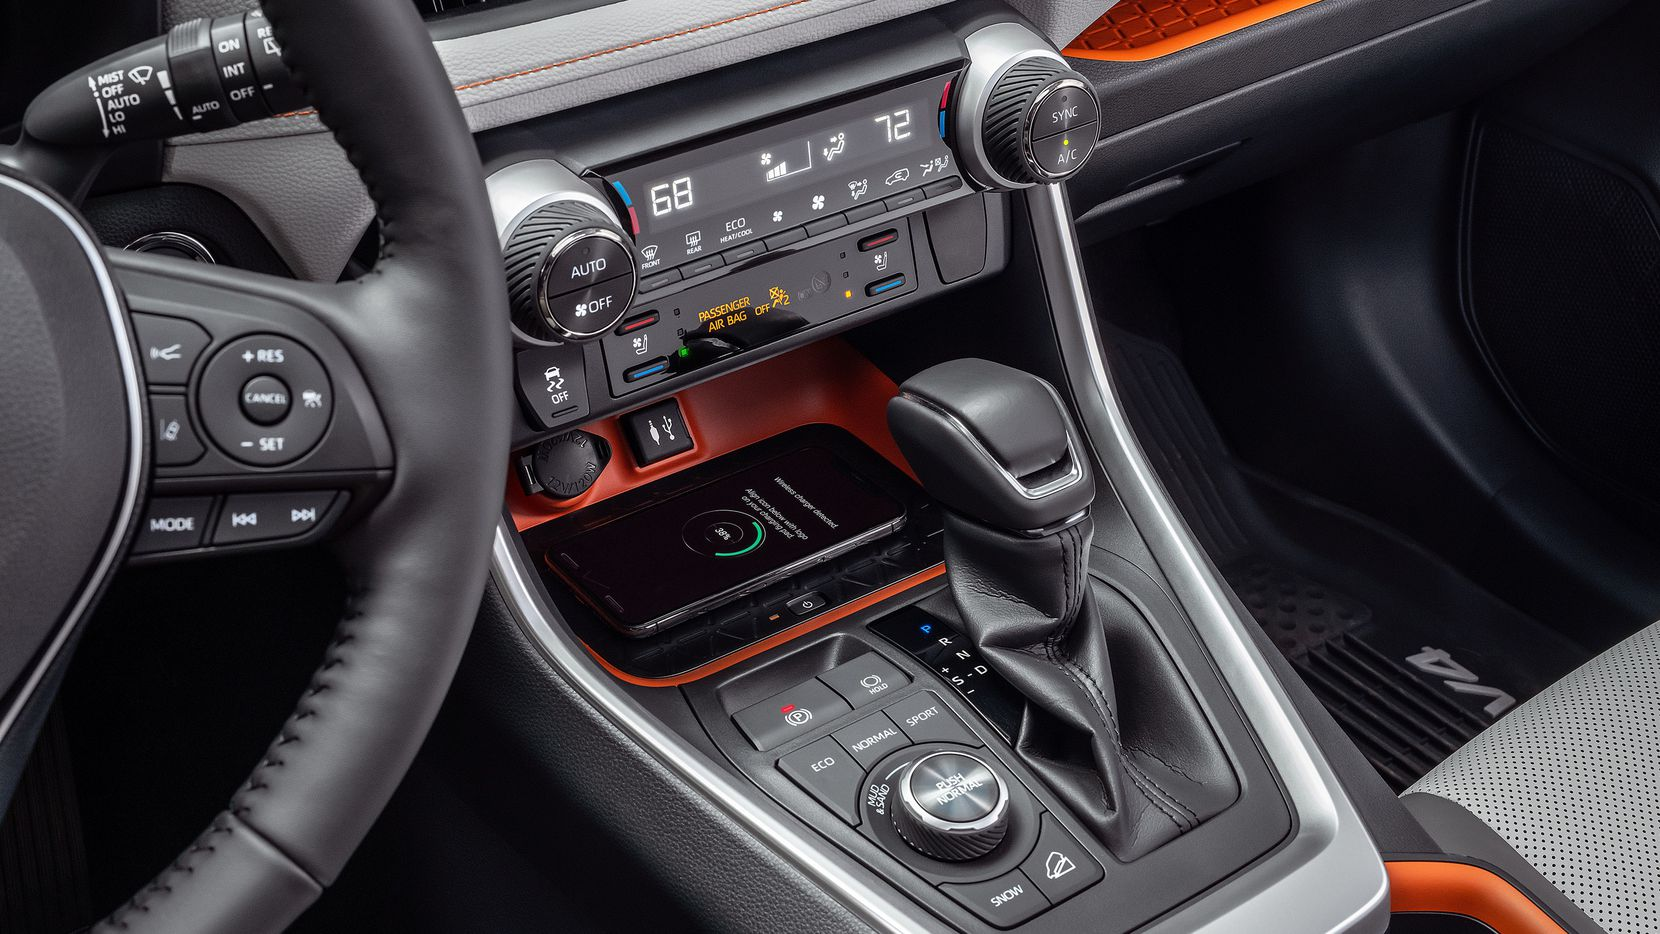 The Adventure's orange trim brings new attitude to the popular SUV line.